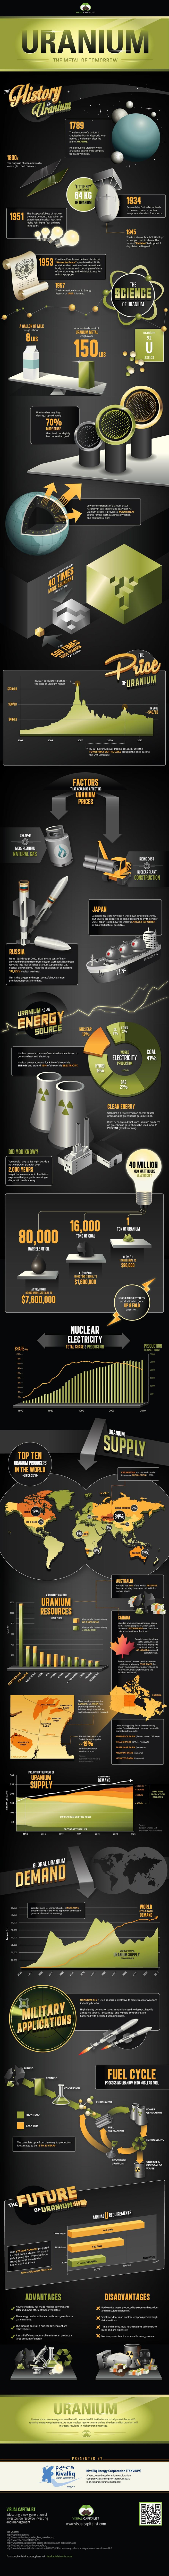 Uranium: The metal of tomorrow